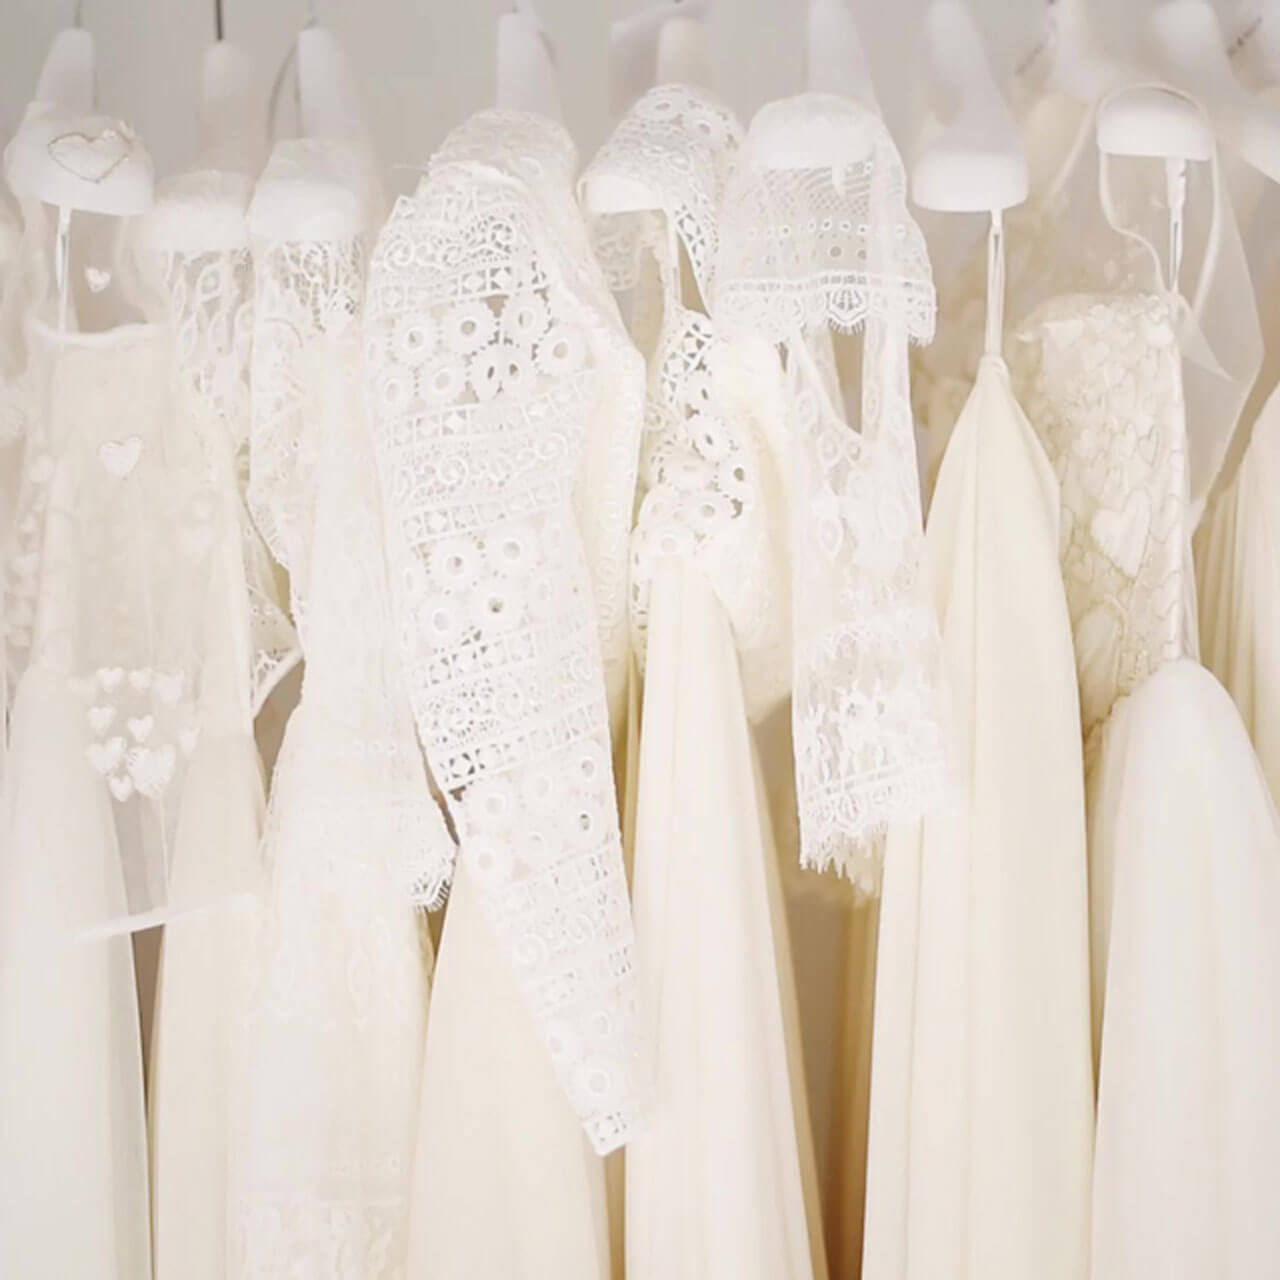 Nadia Manzato luxury fabrics and materials